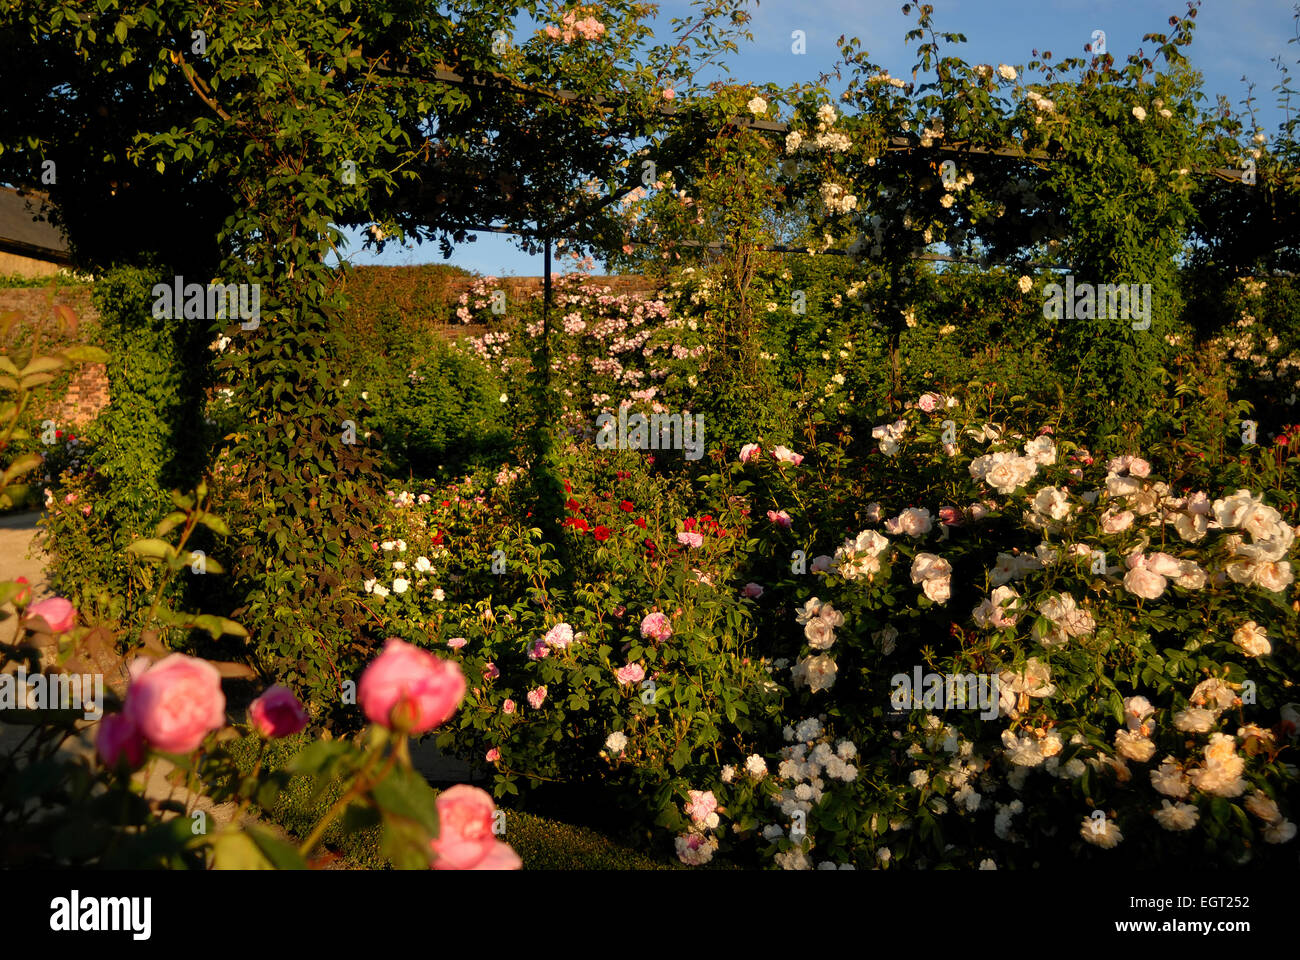 Rose Garden, The Alnwick Garden Stock Photo: 79204526 - Alamy